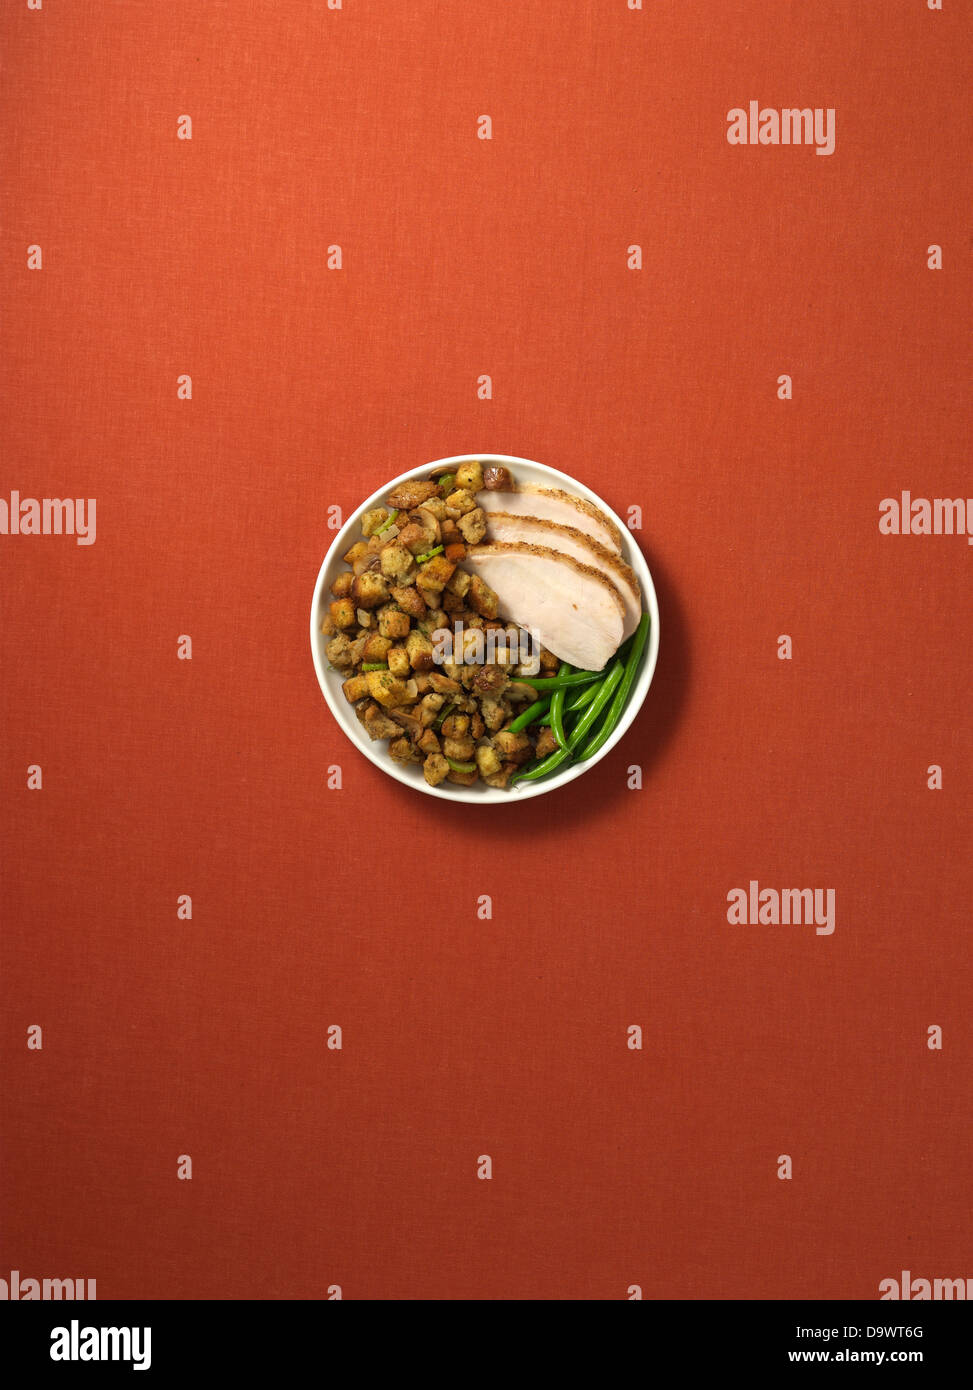 Plato de comida Imagen De Stock